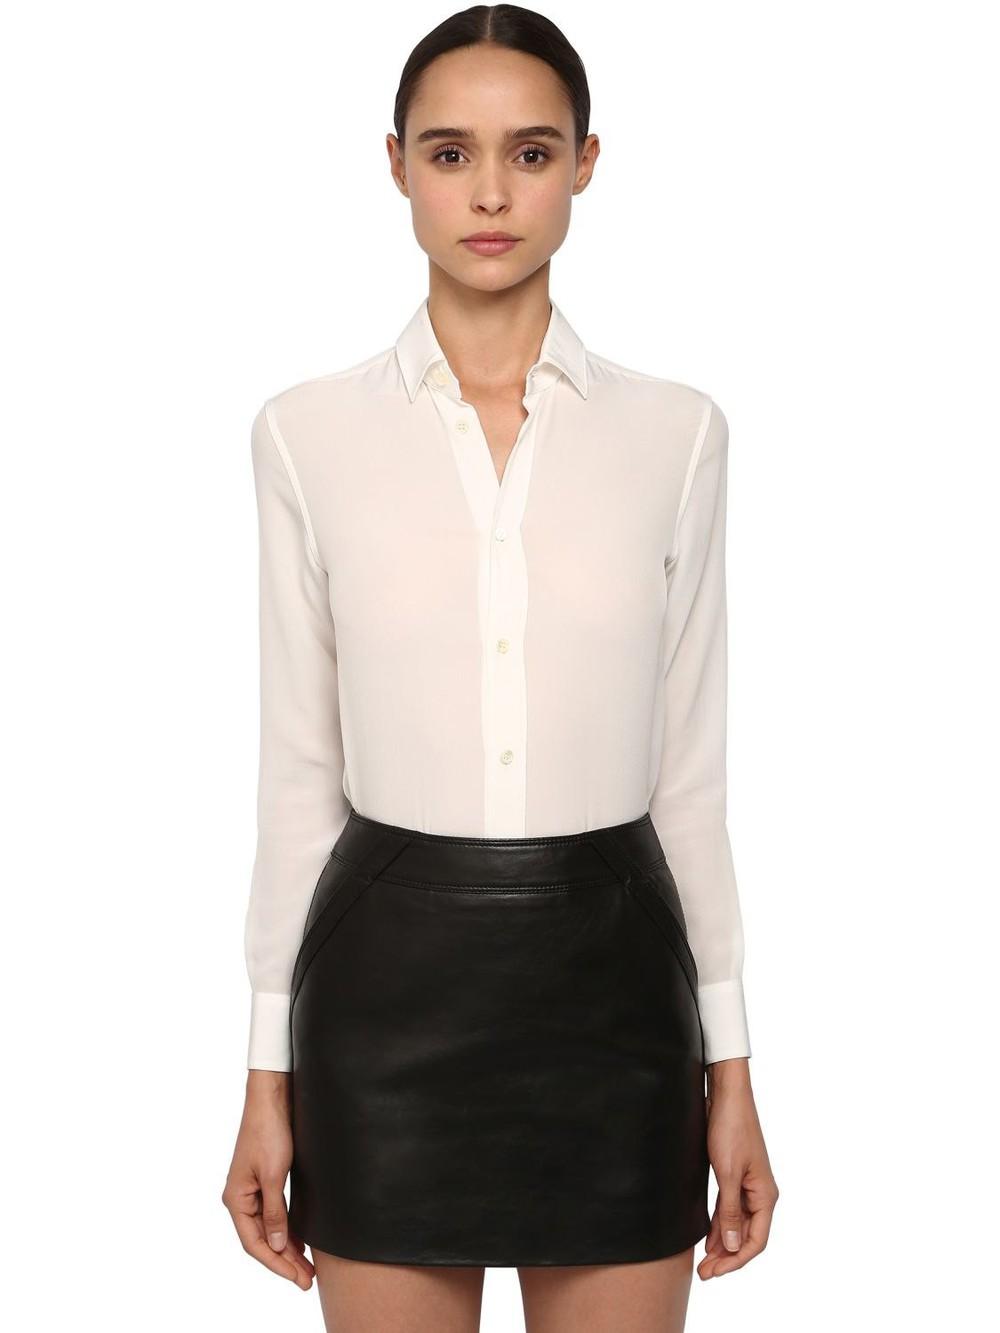 SAINT LAURENT Classic Crepe De Chine Shirt in white